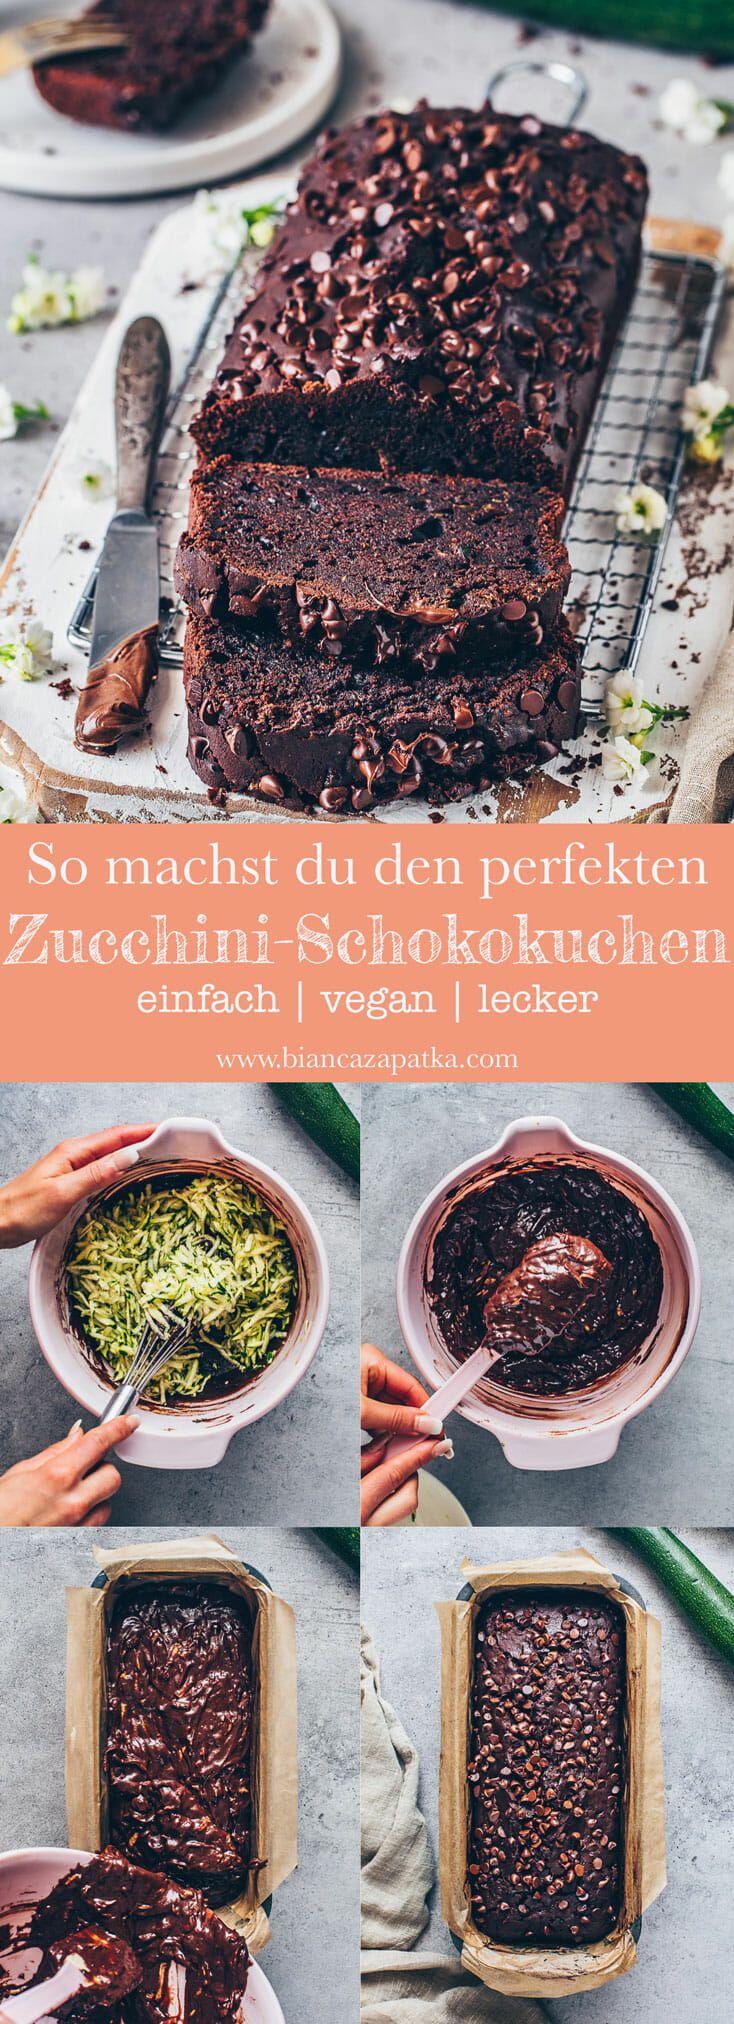 Veganer Zucchini-Schokokuchen #cupcakecakes